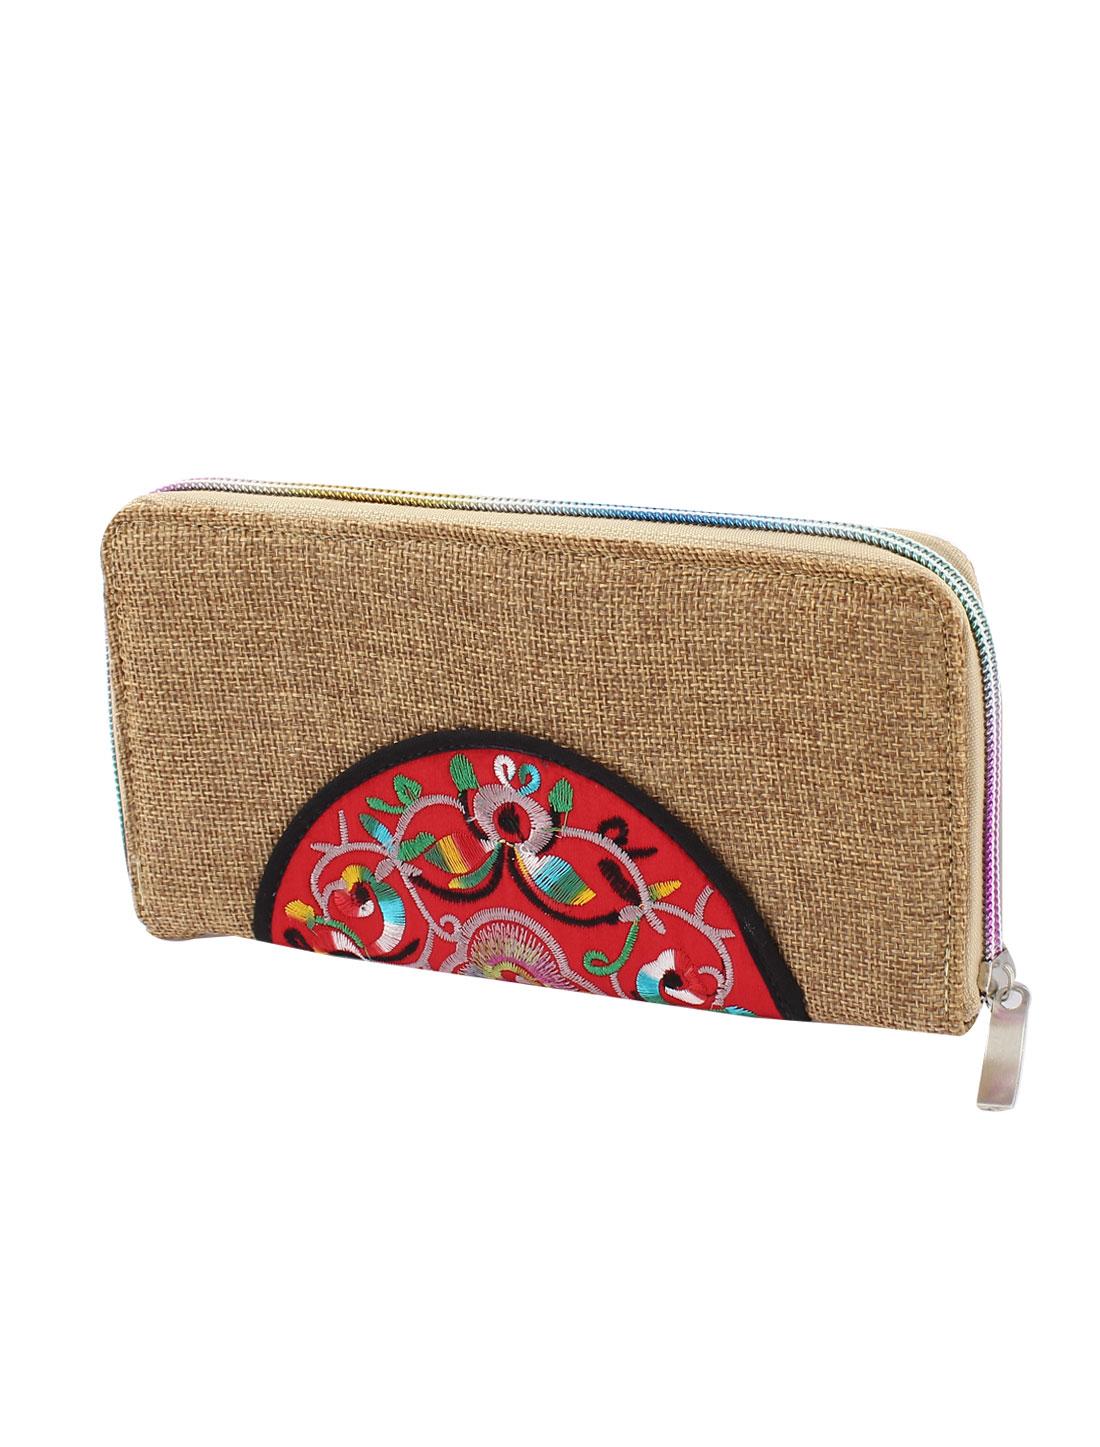 Light Coffee Color Linen Rectangle Design Floral Pattern Zipper Closure Wallet Purse for Ladies